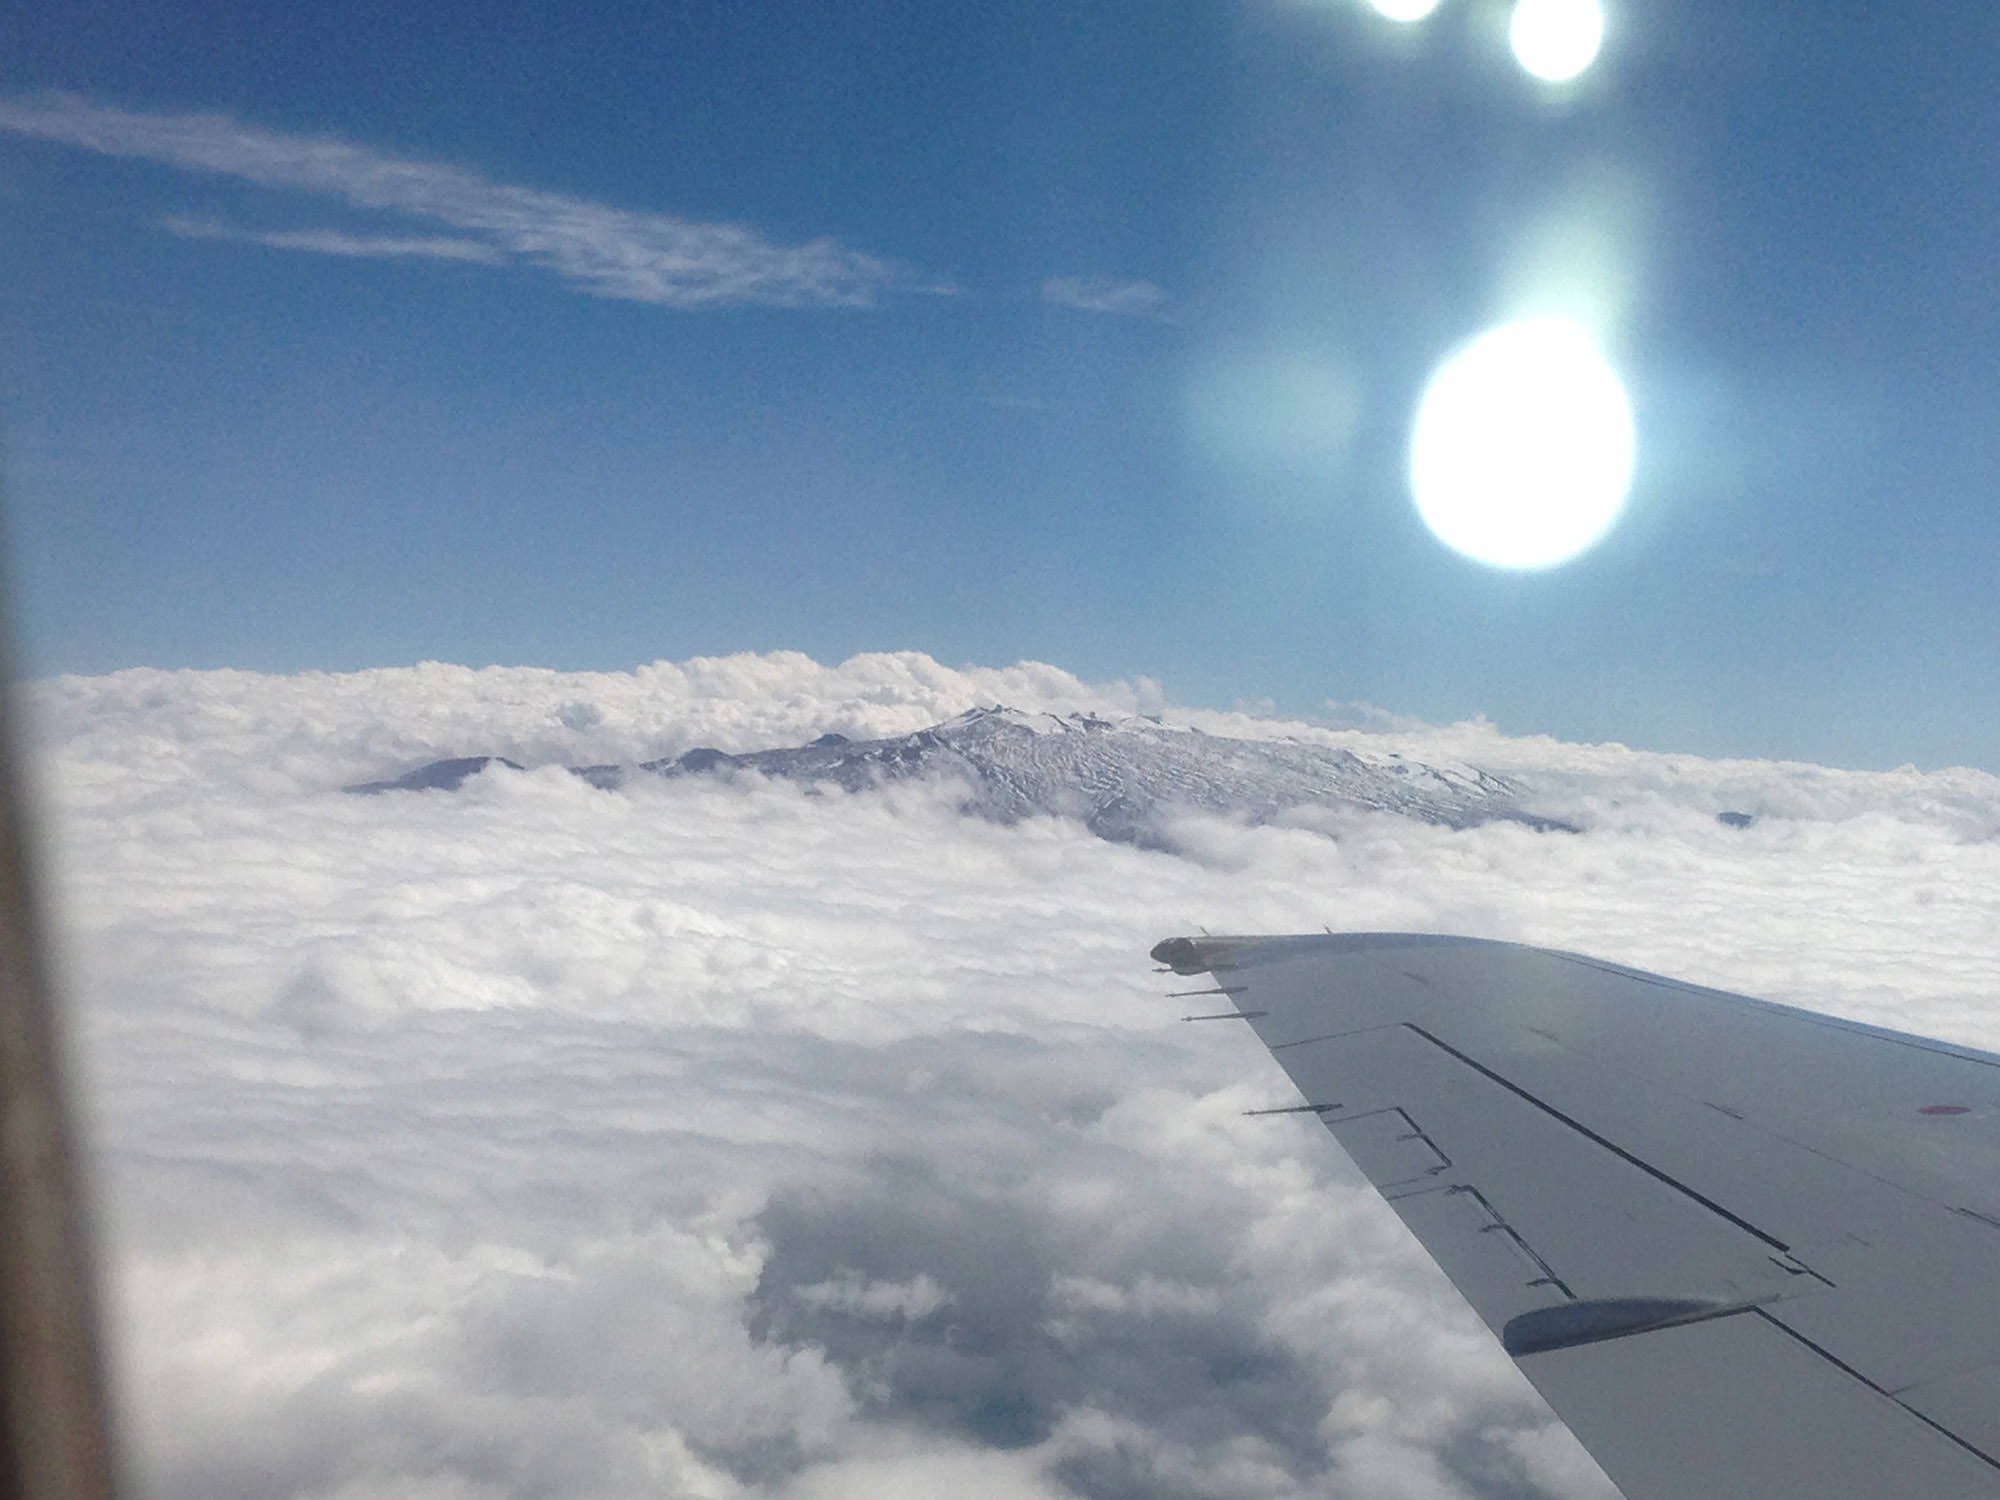 Fig. 17 Summit of Mauna Kea (Mauna a Wākea), Hawai'i Island, seen from airplane, March 2014. Photo: ©Sally Promey